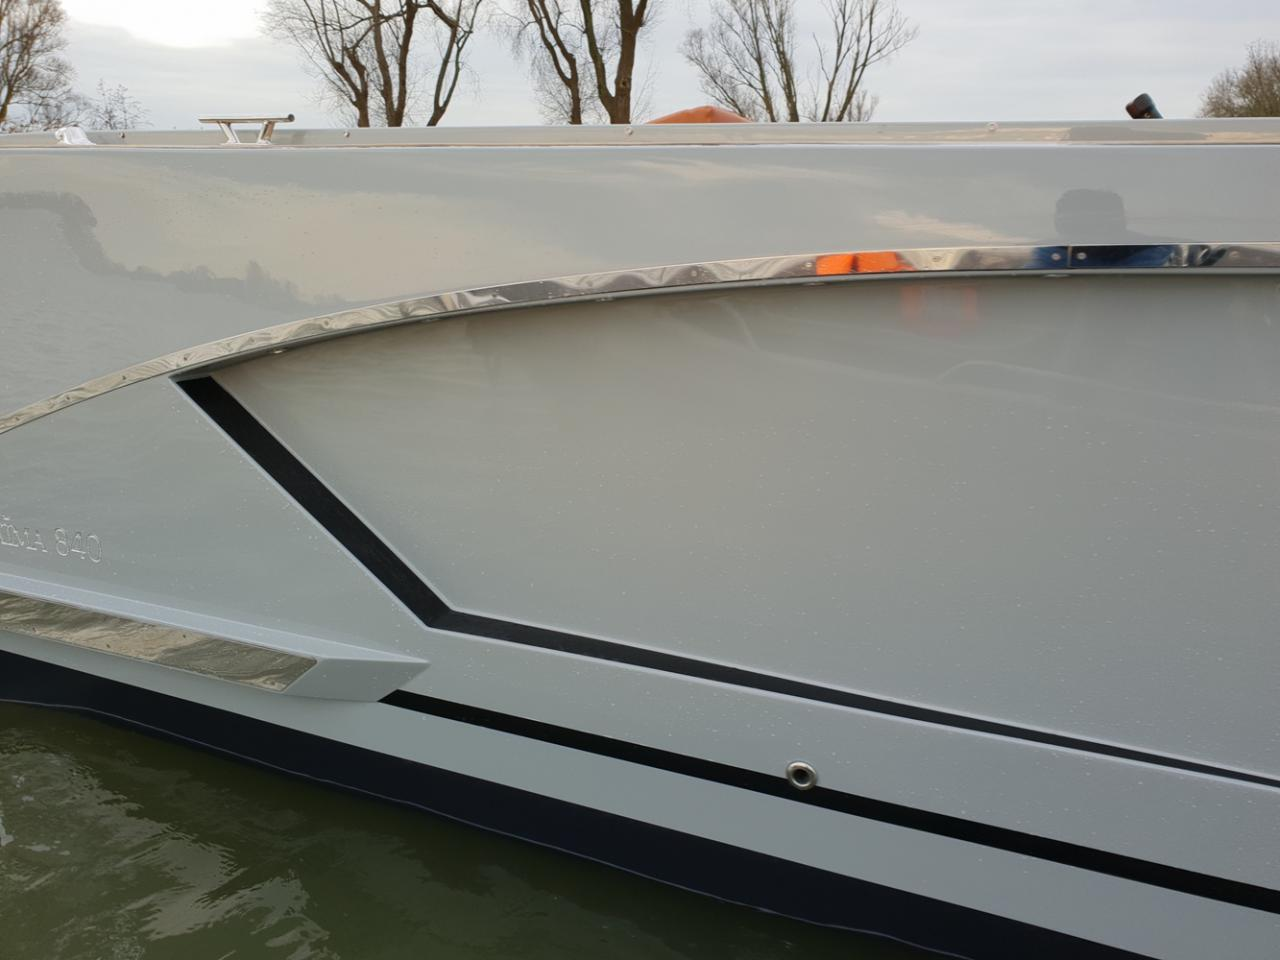 Maxima 840 tender 28